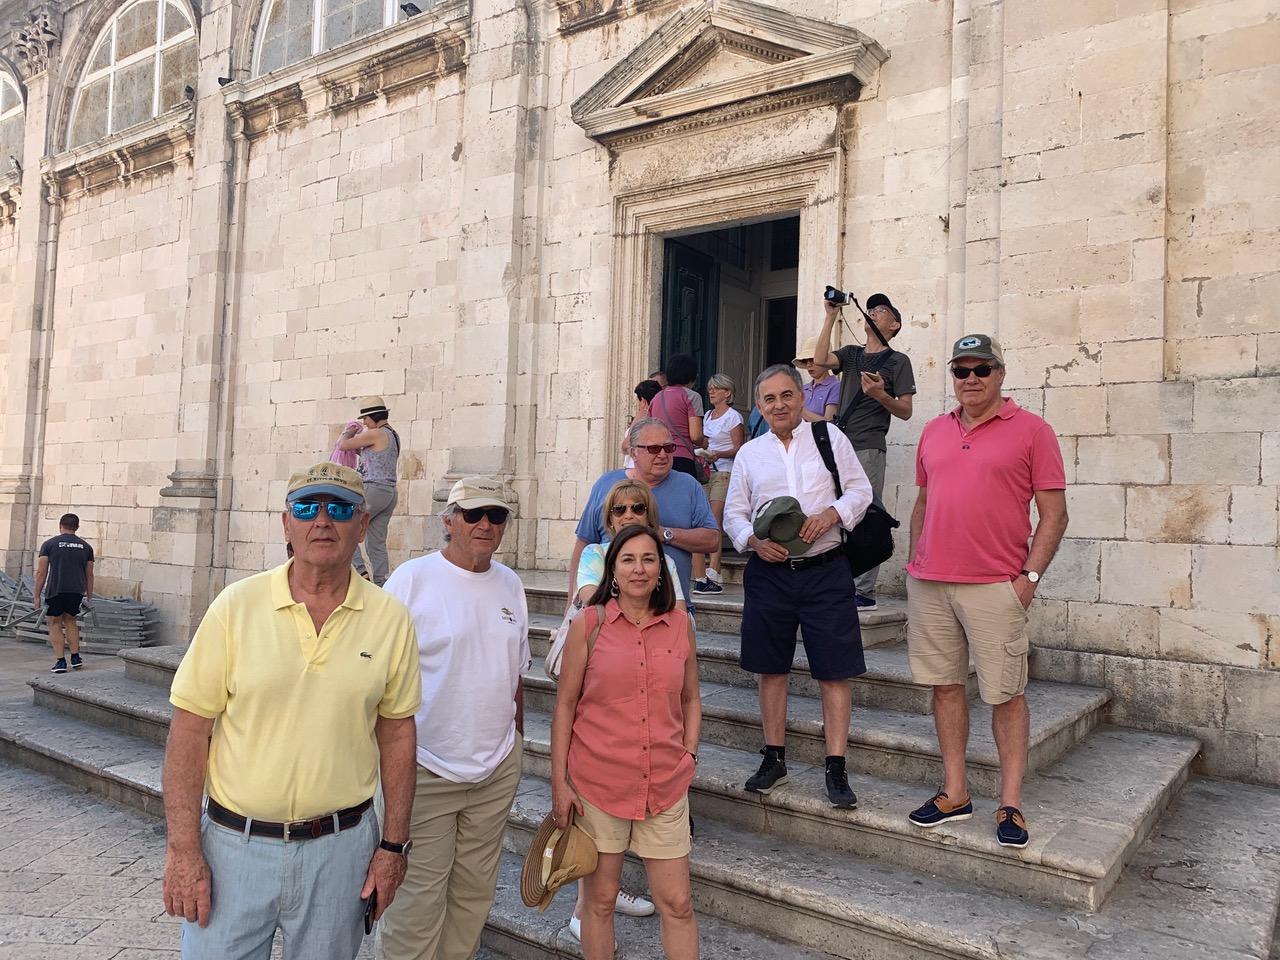 Viaje en grupo frente a la catedral de Dubrovnik